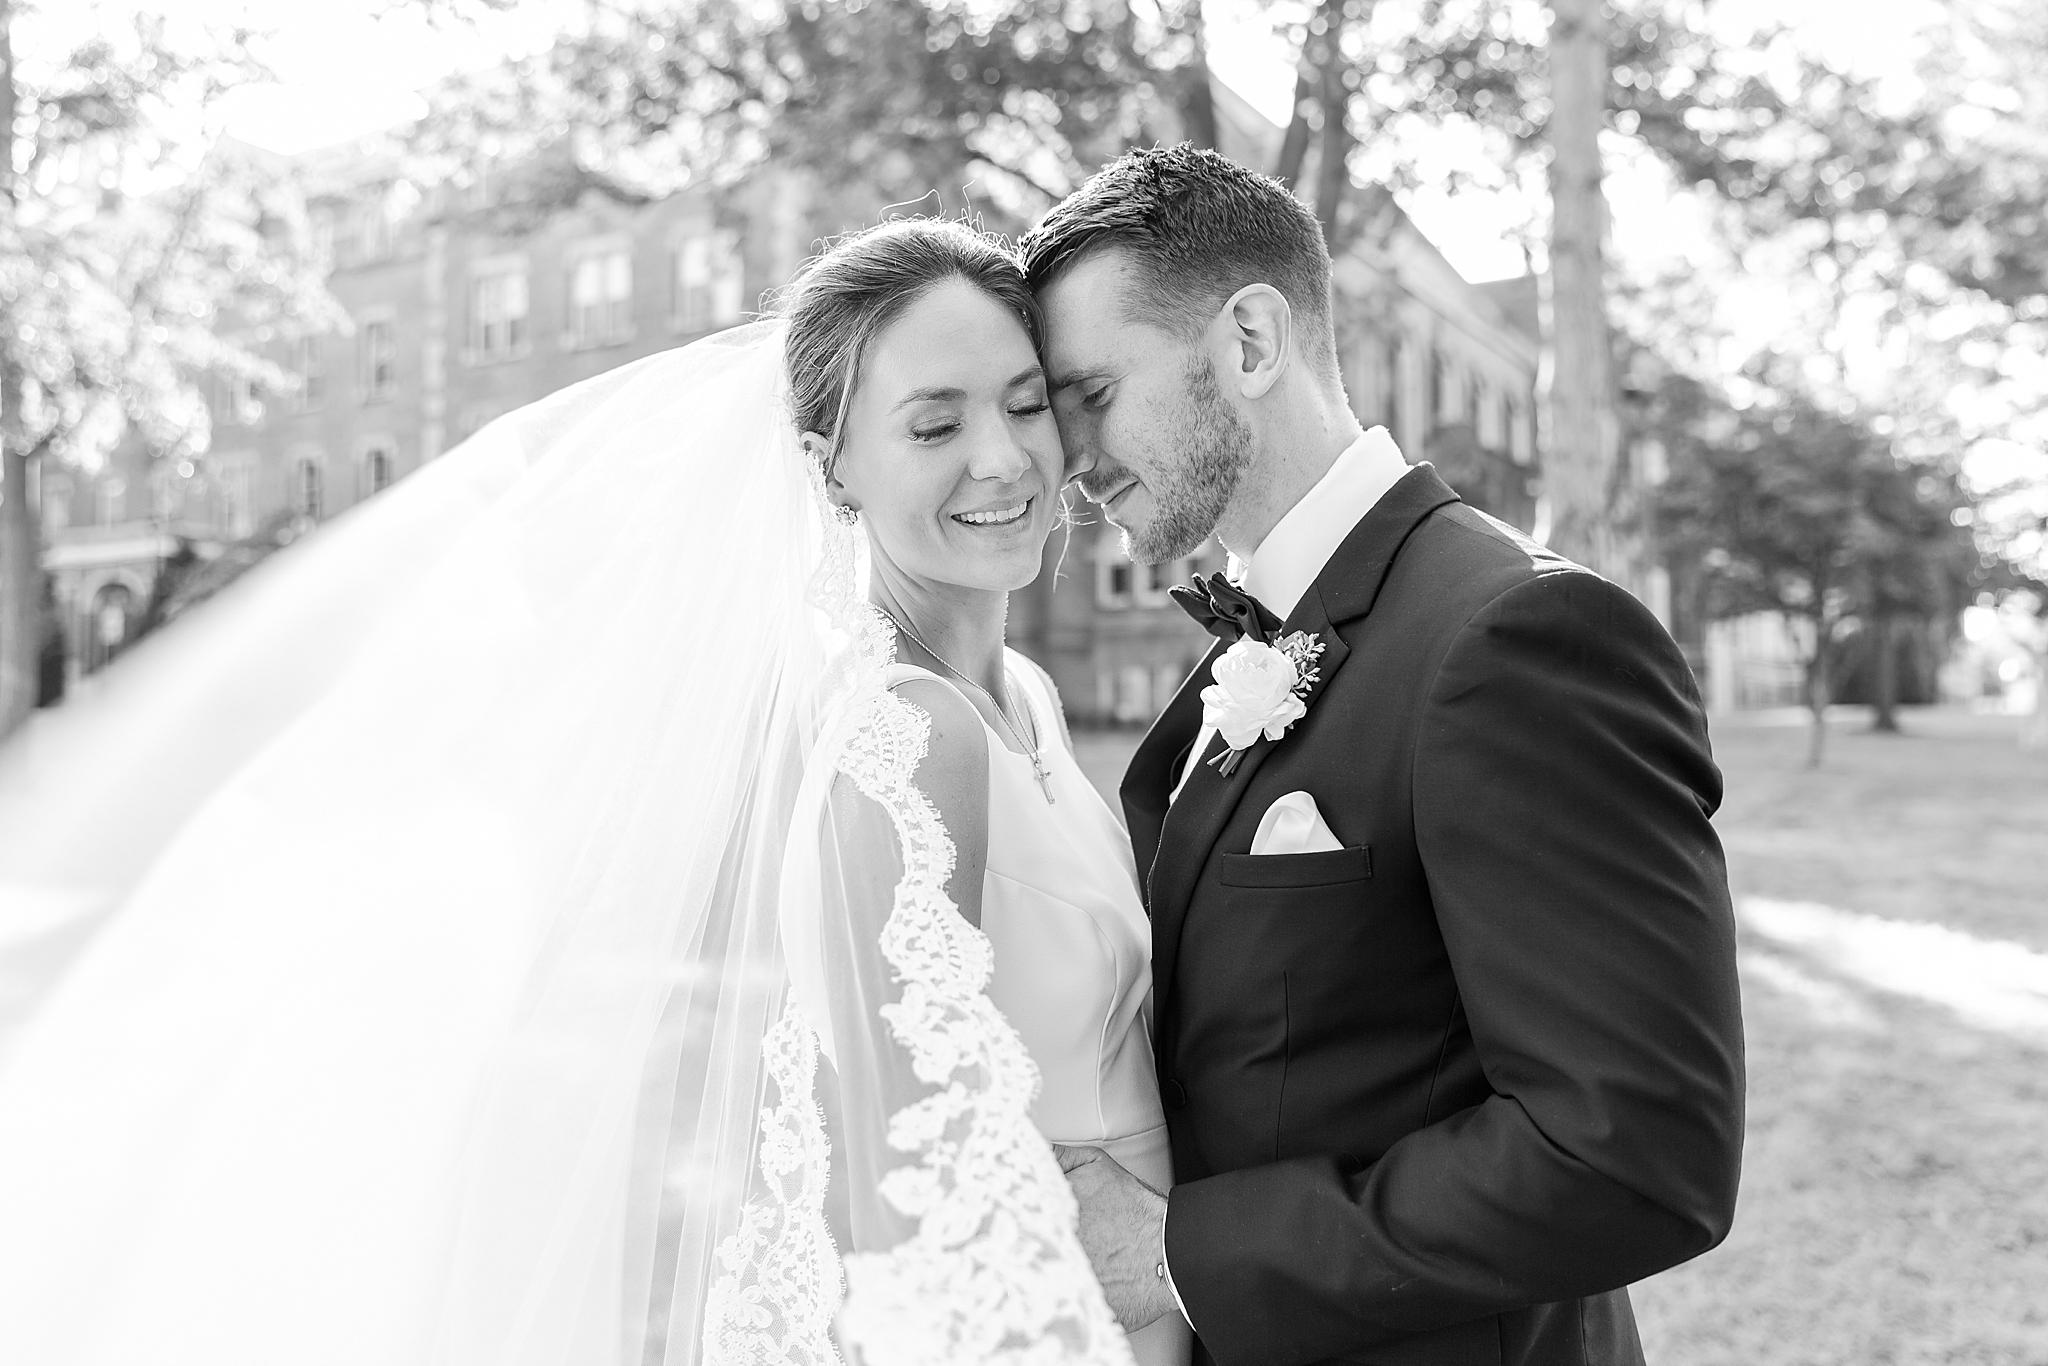 detroit-wedding-photographer-grosse-pointe-academy-chapel-detroit-golf-club-wedding-carly-matt-by-courtney-carolyn-photography_0086.jpg